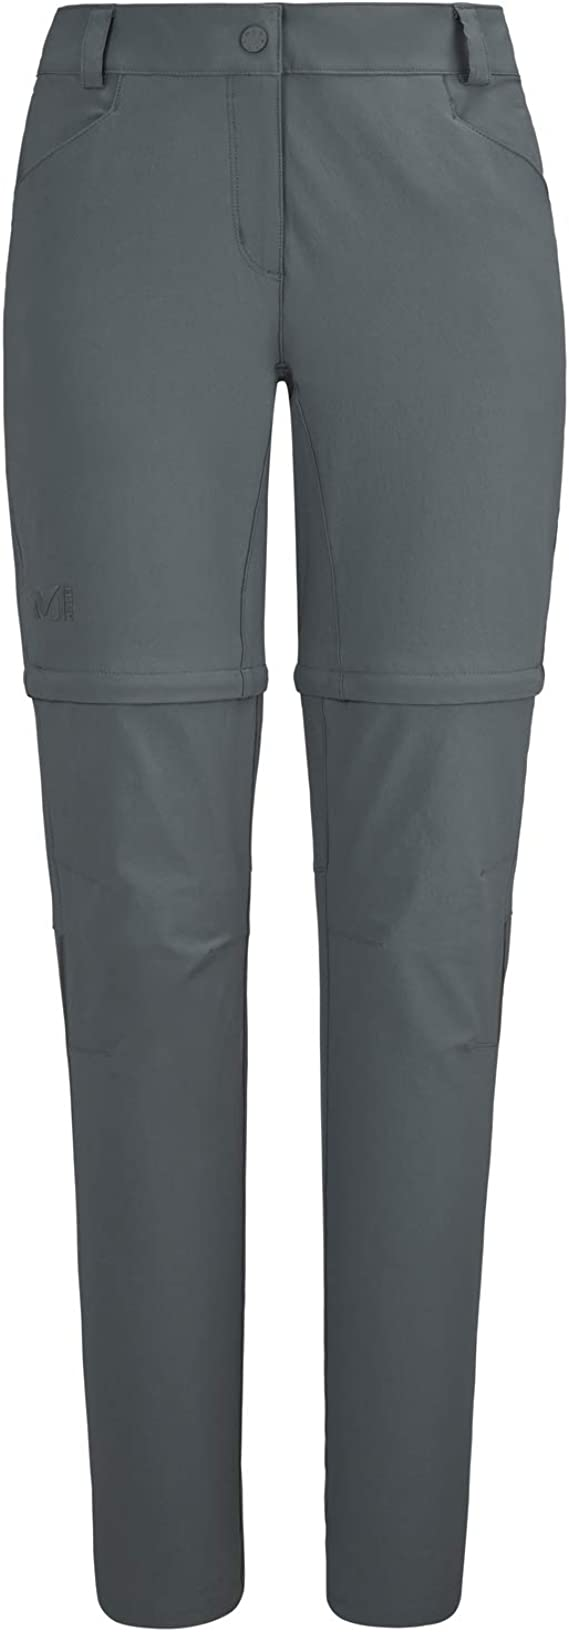 Millet Trekker Stretch Zip-Off W Hiking Pants